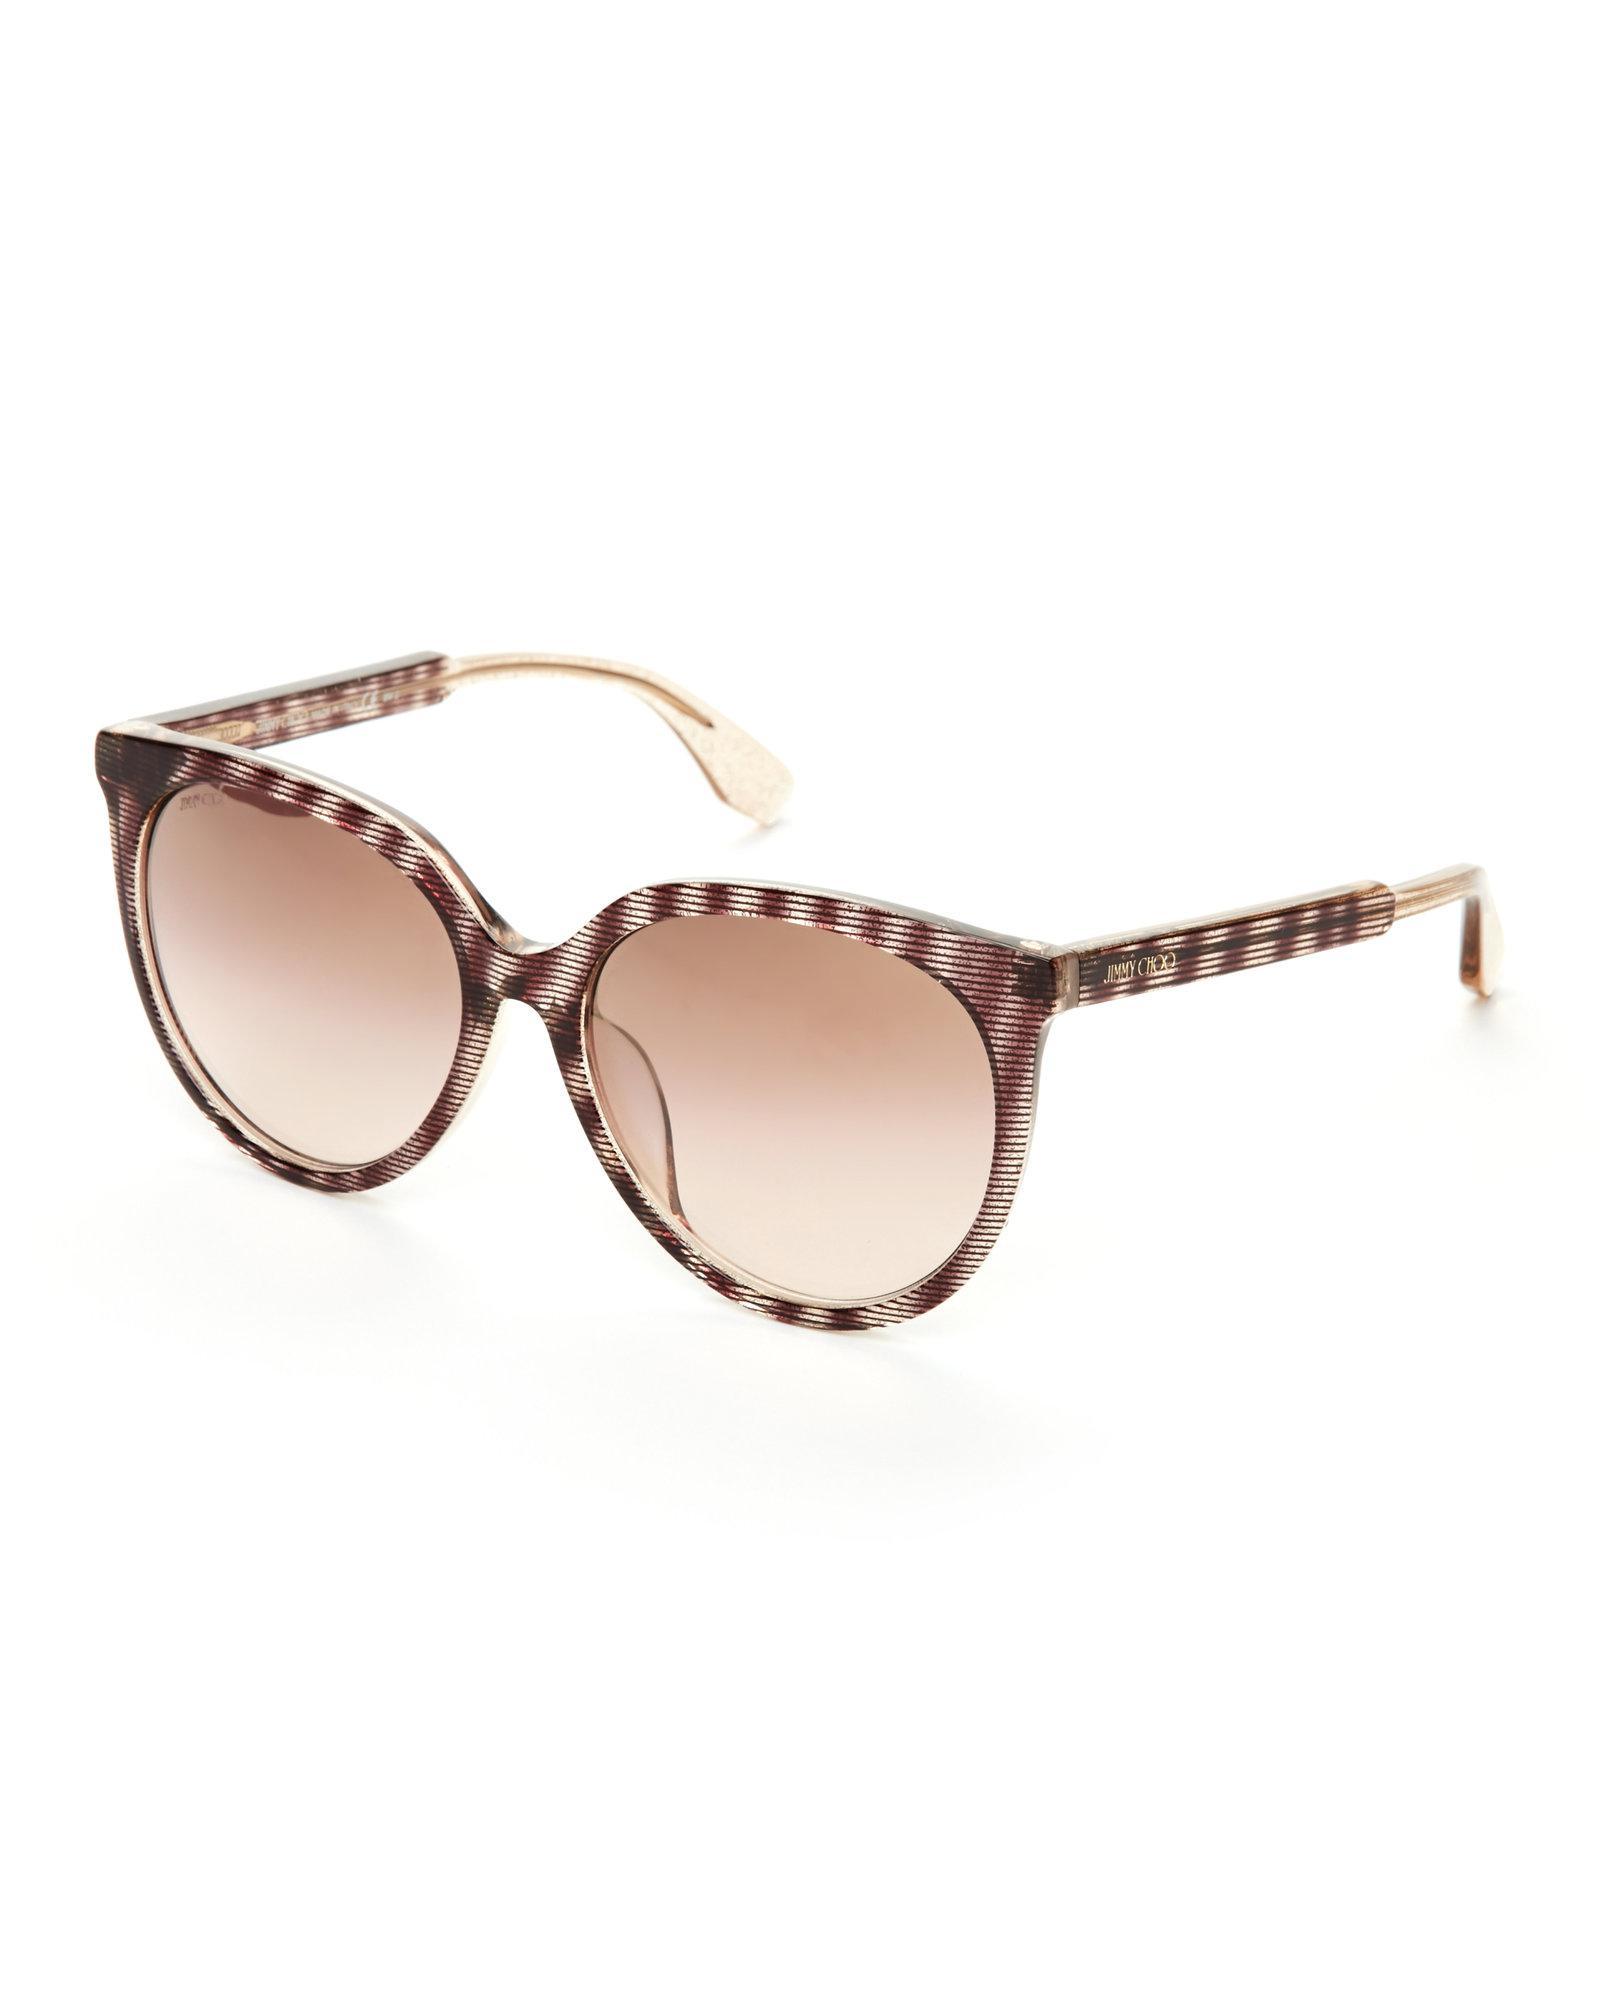 1190d91afe1 Lyst - Jimmy Choo Reece Cat Eye Sunglasses